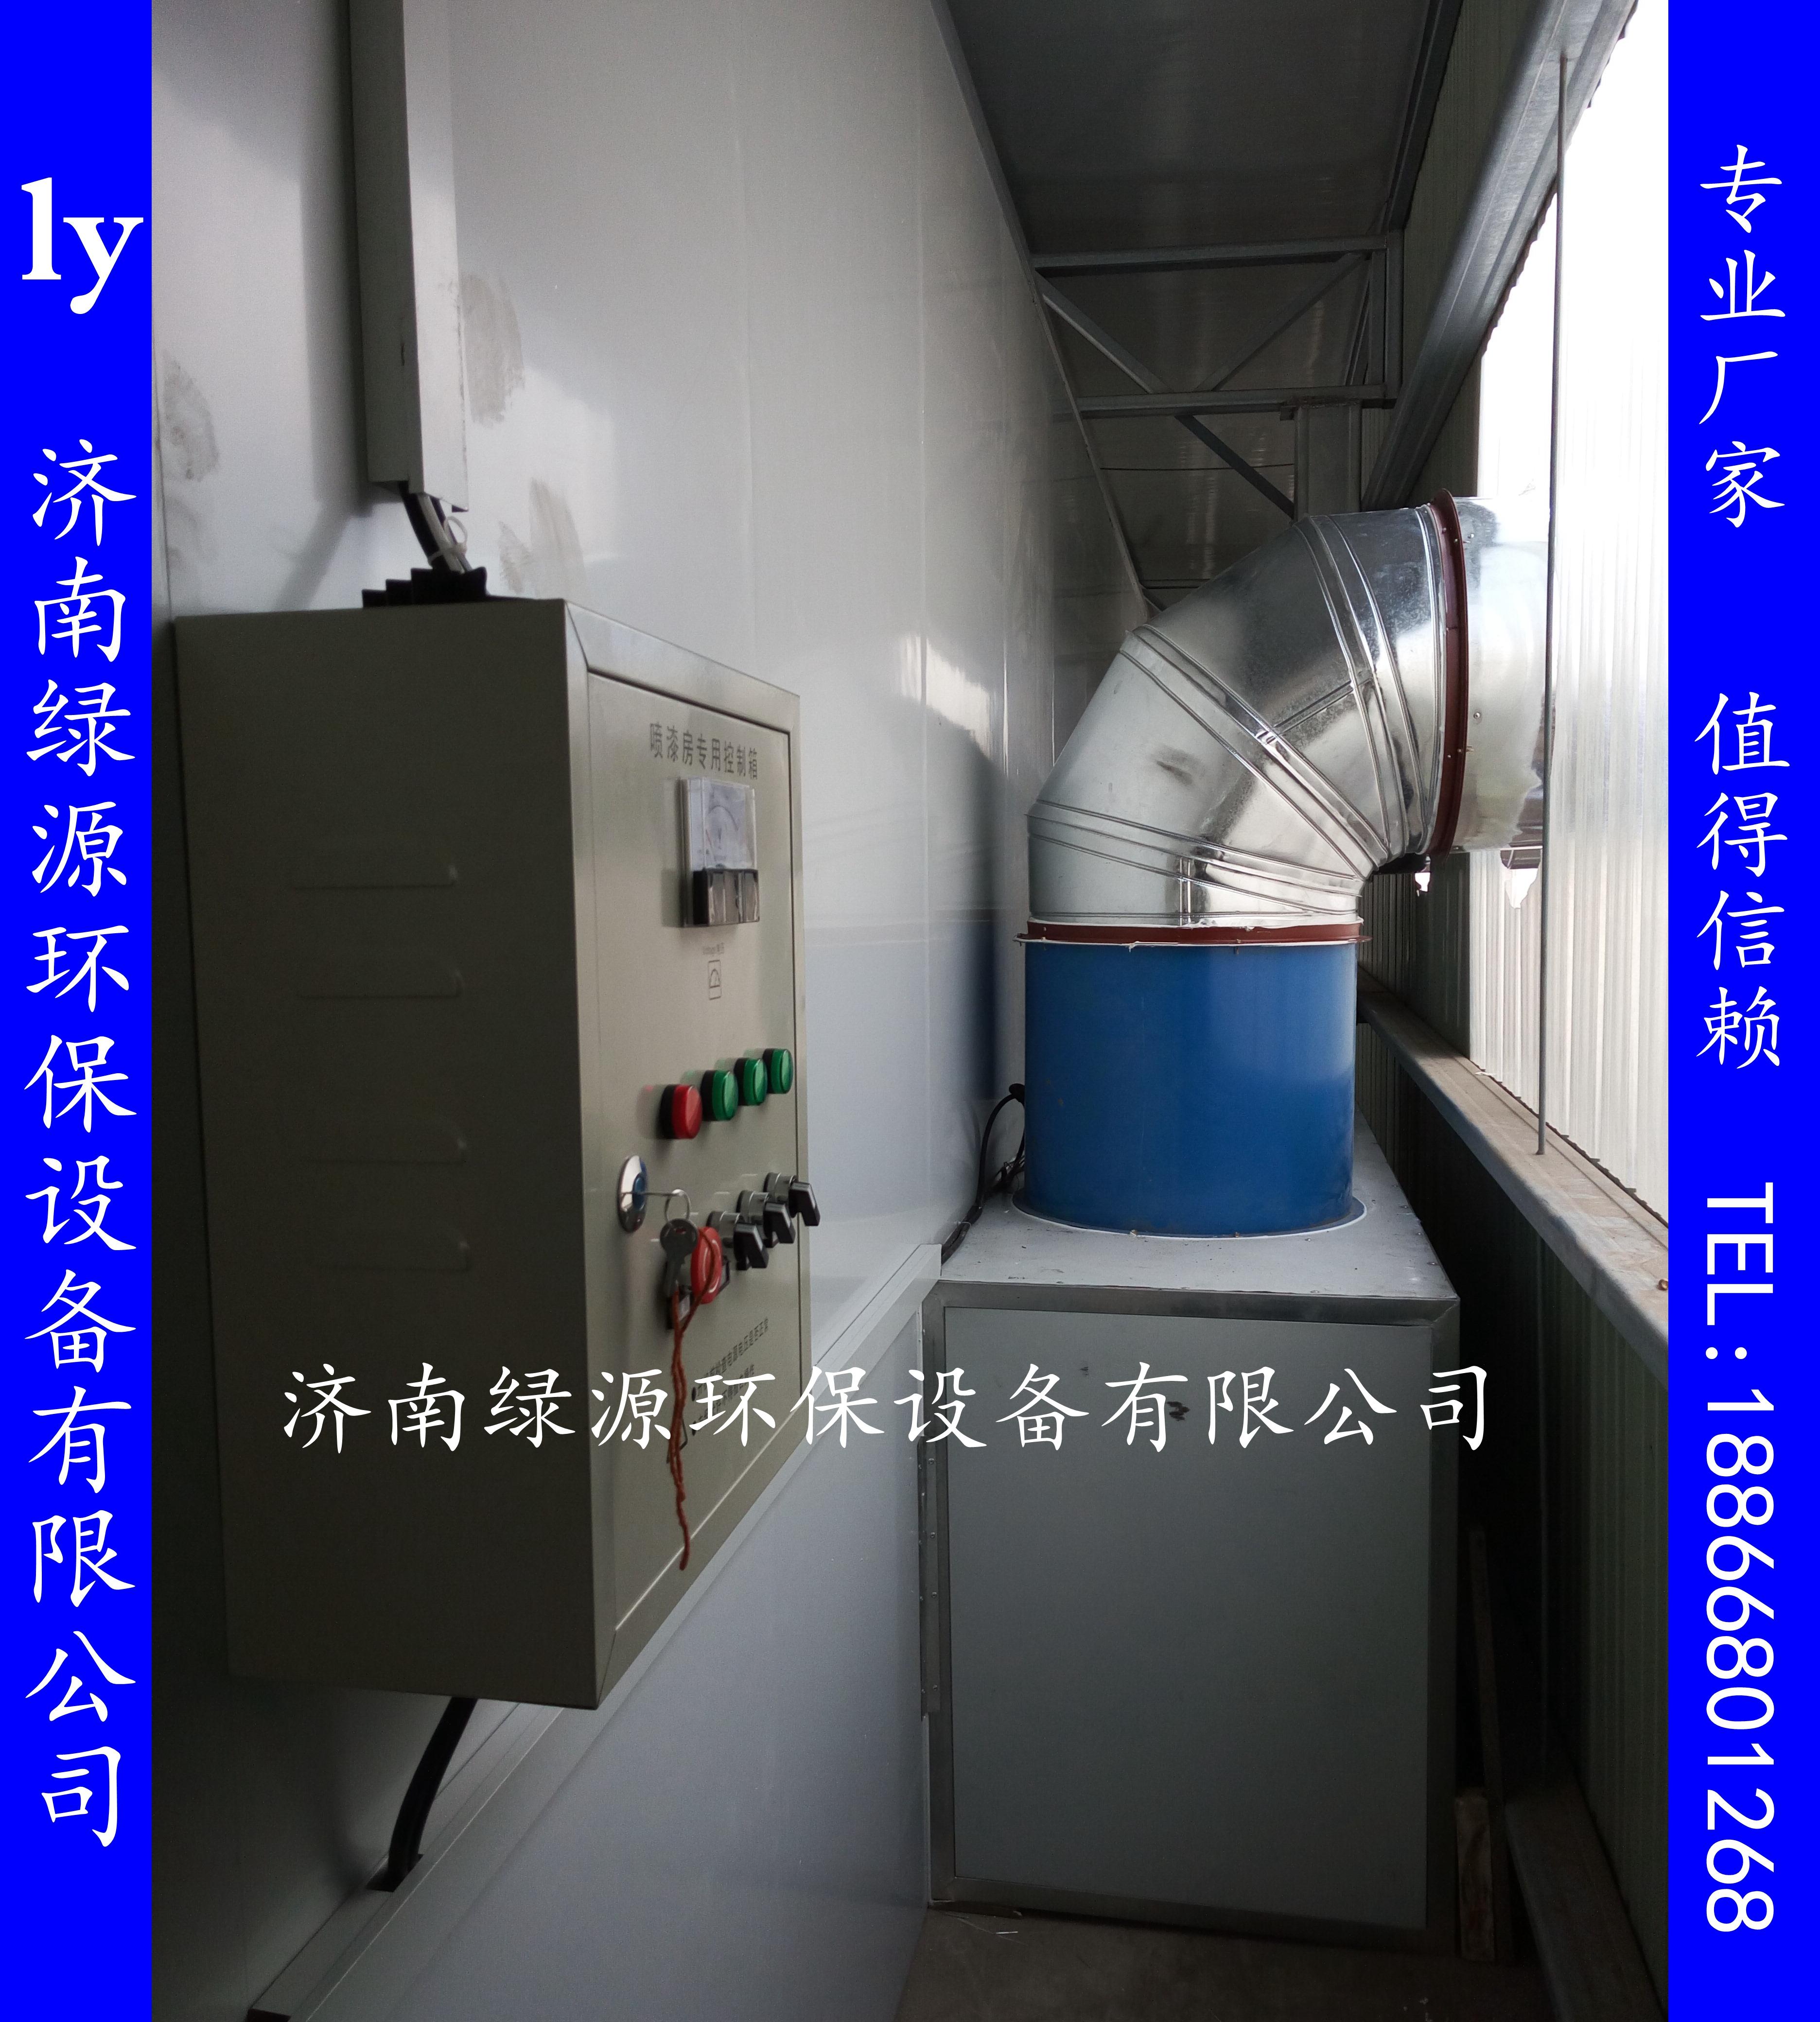 IMG_20150403_105057.jpg